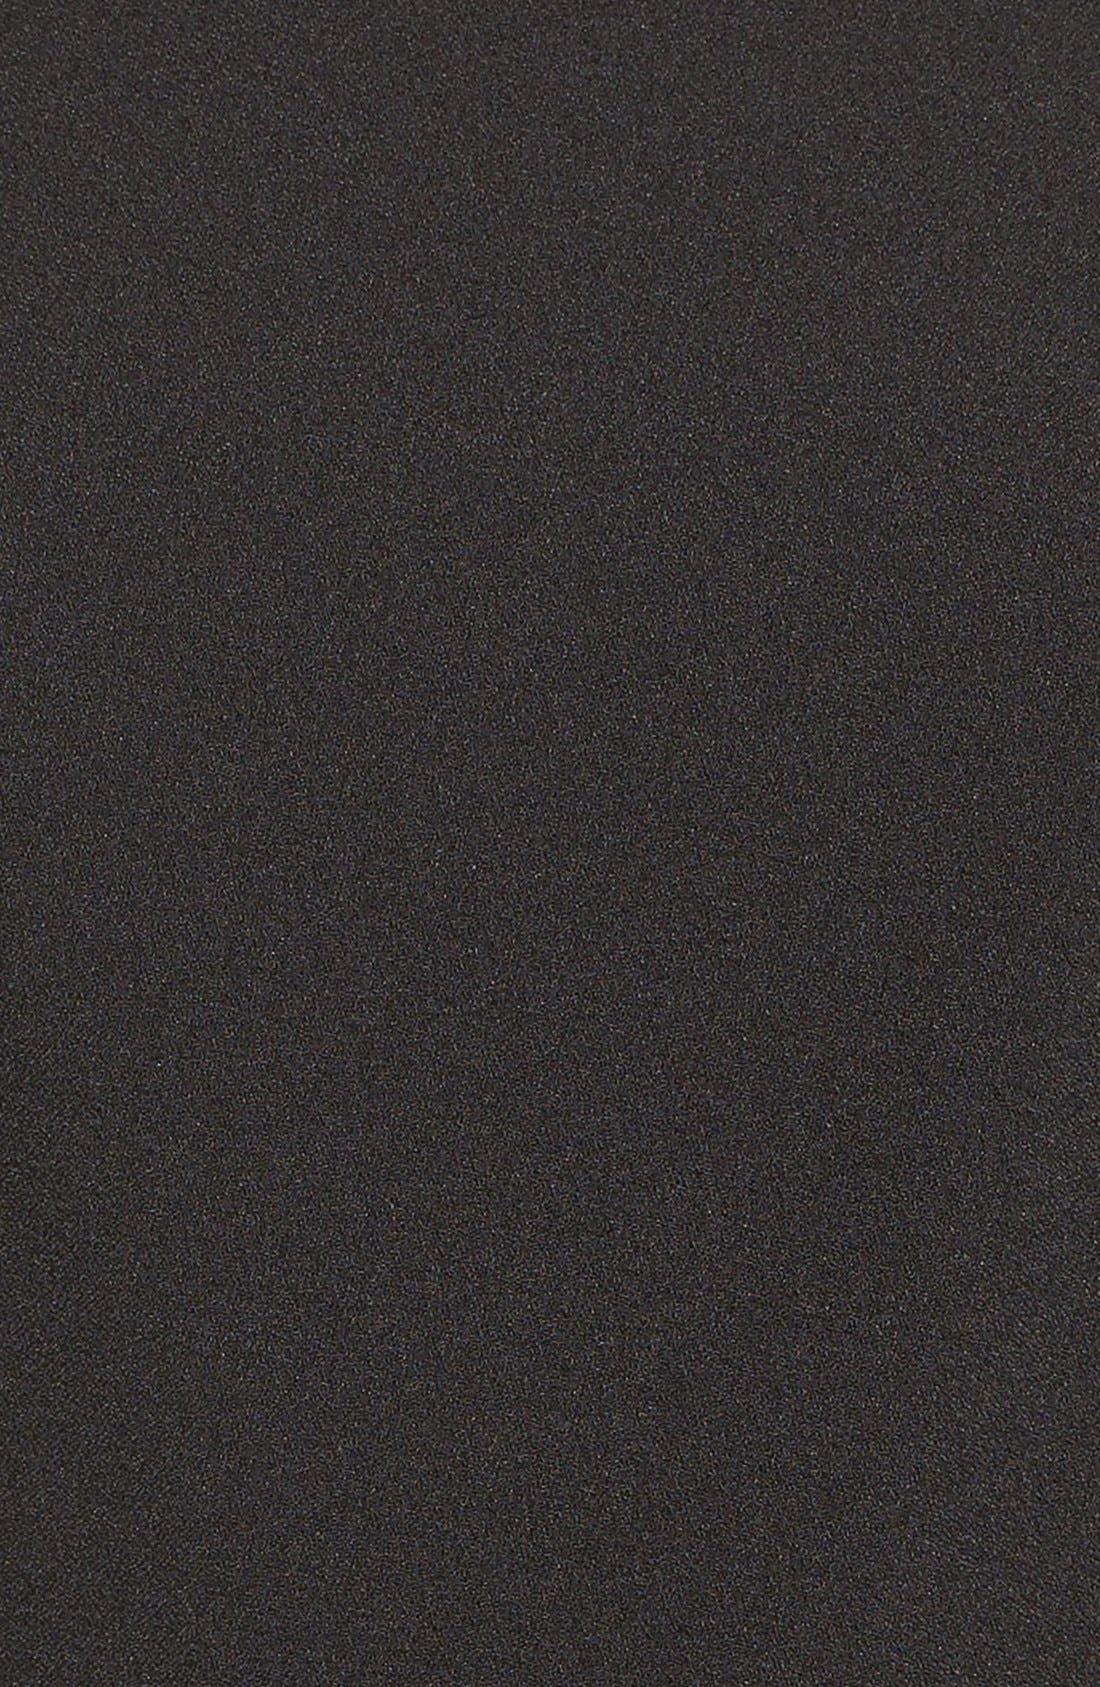 Cold Shoulder Jumpsuit,                             Alternate thumbnail 7, color,                             Black